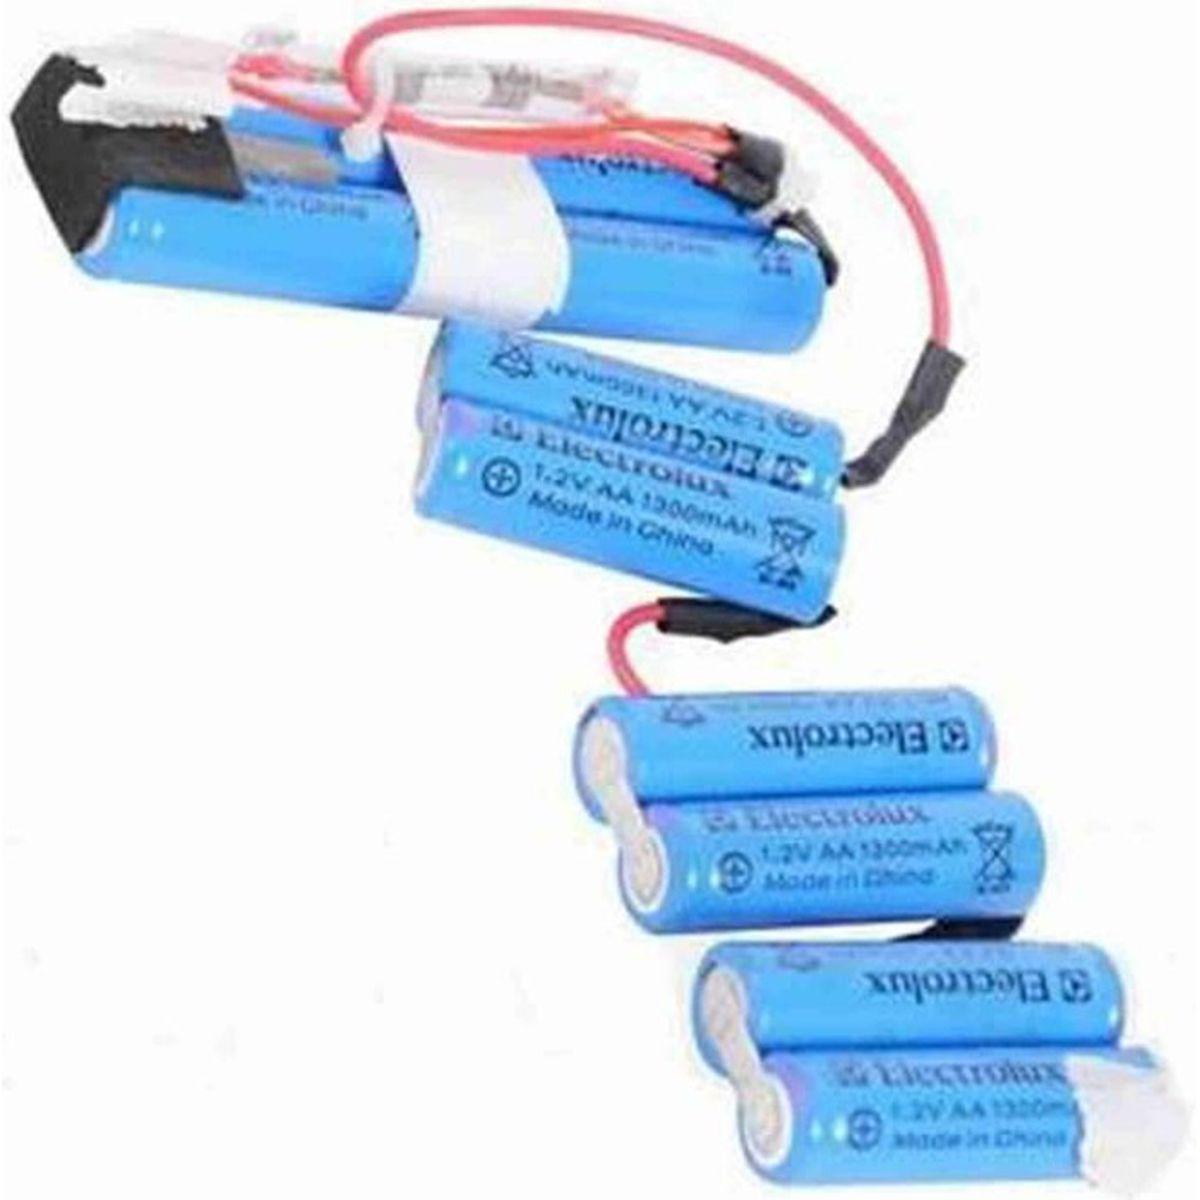 ELECTROLUX BATTERIE,ENSEMBLE,12V POUR ASPIRATEUR ELECTROLUX